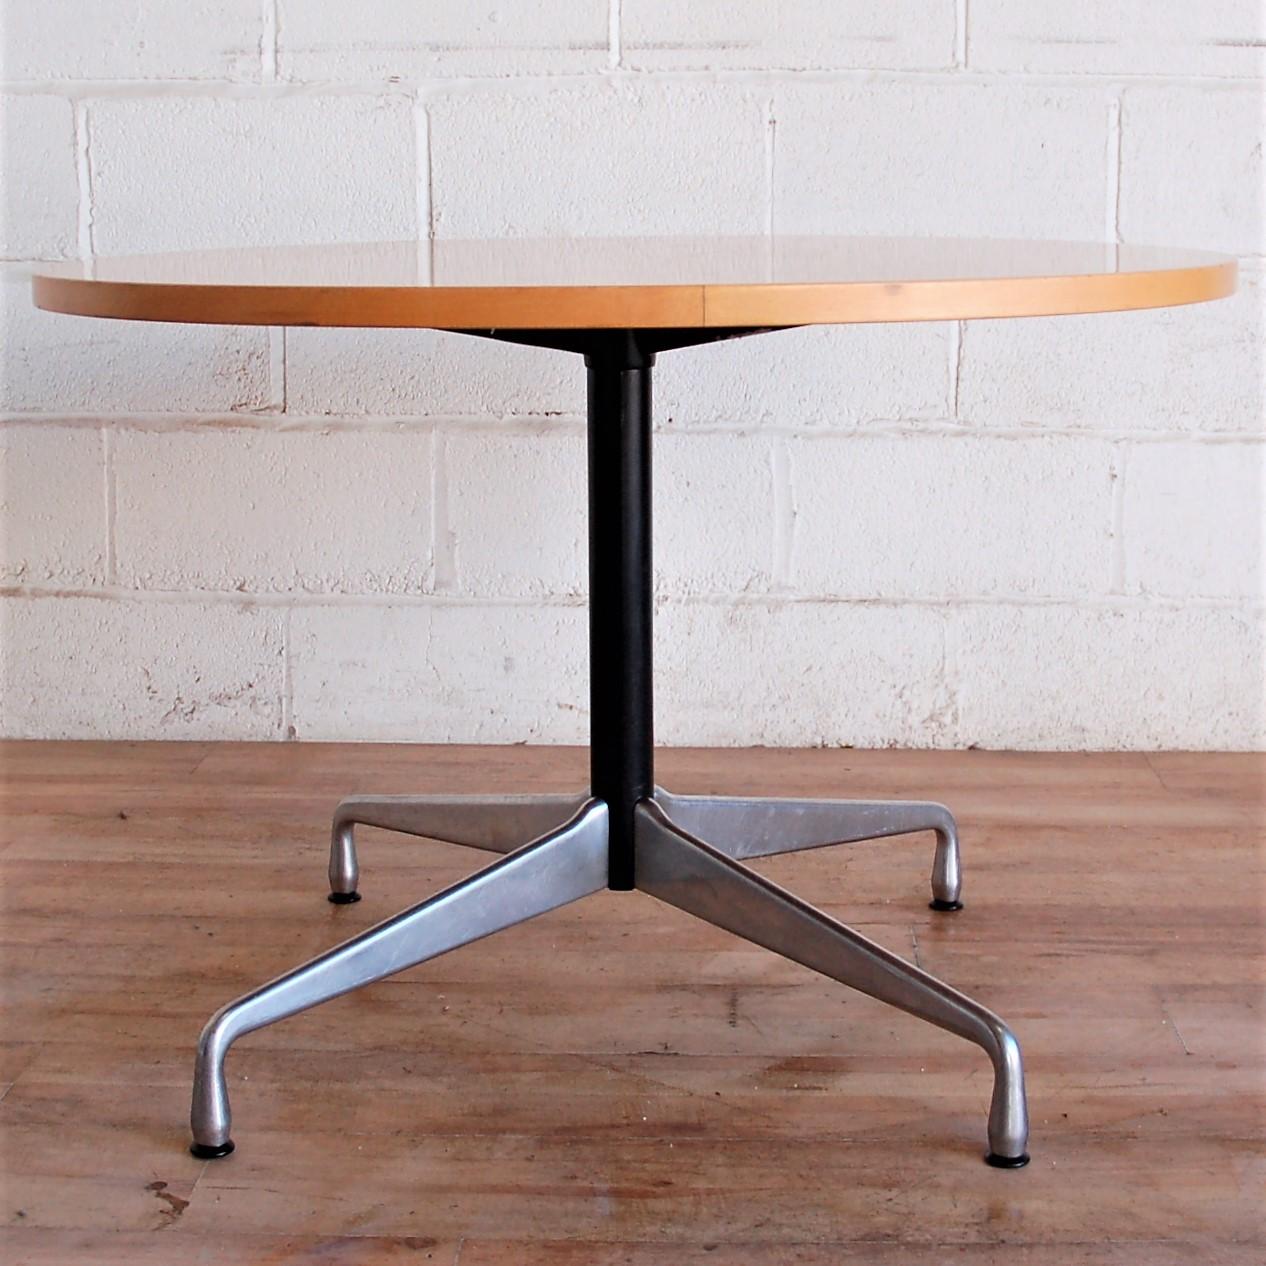 VITRA HERMAN MILLER Charles Eames Table 15043